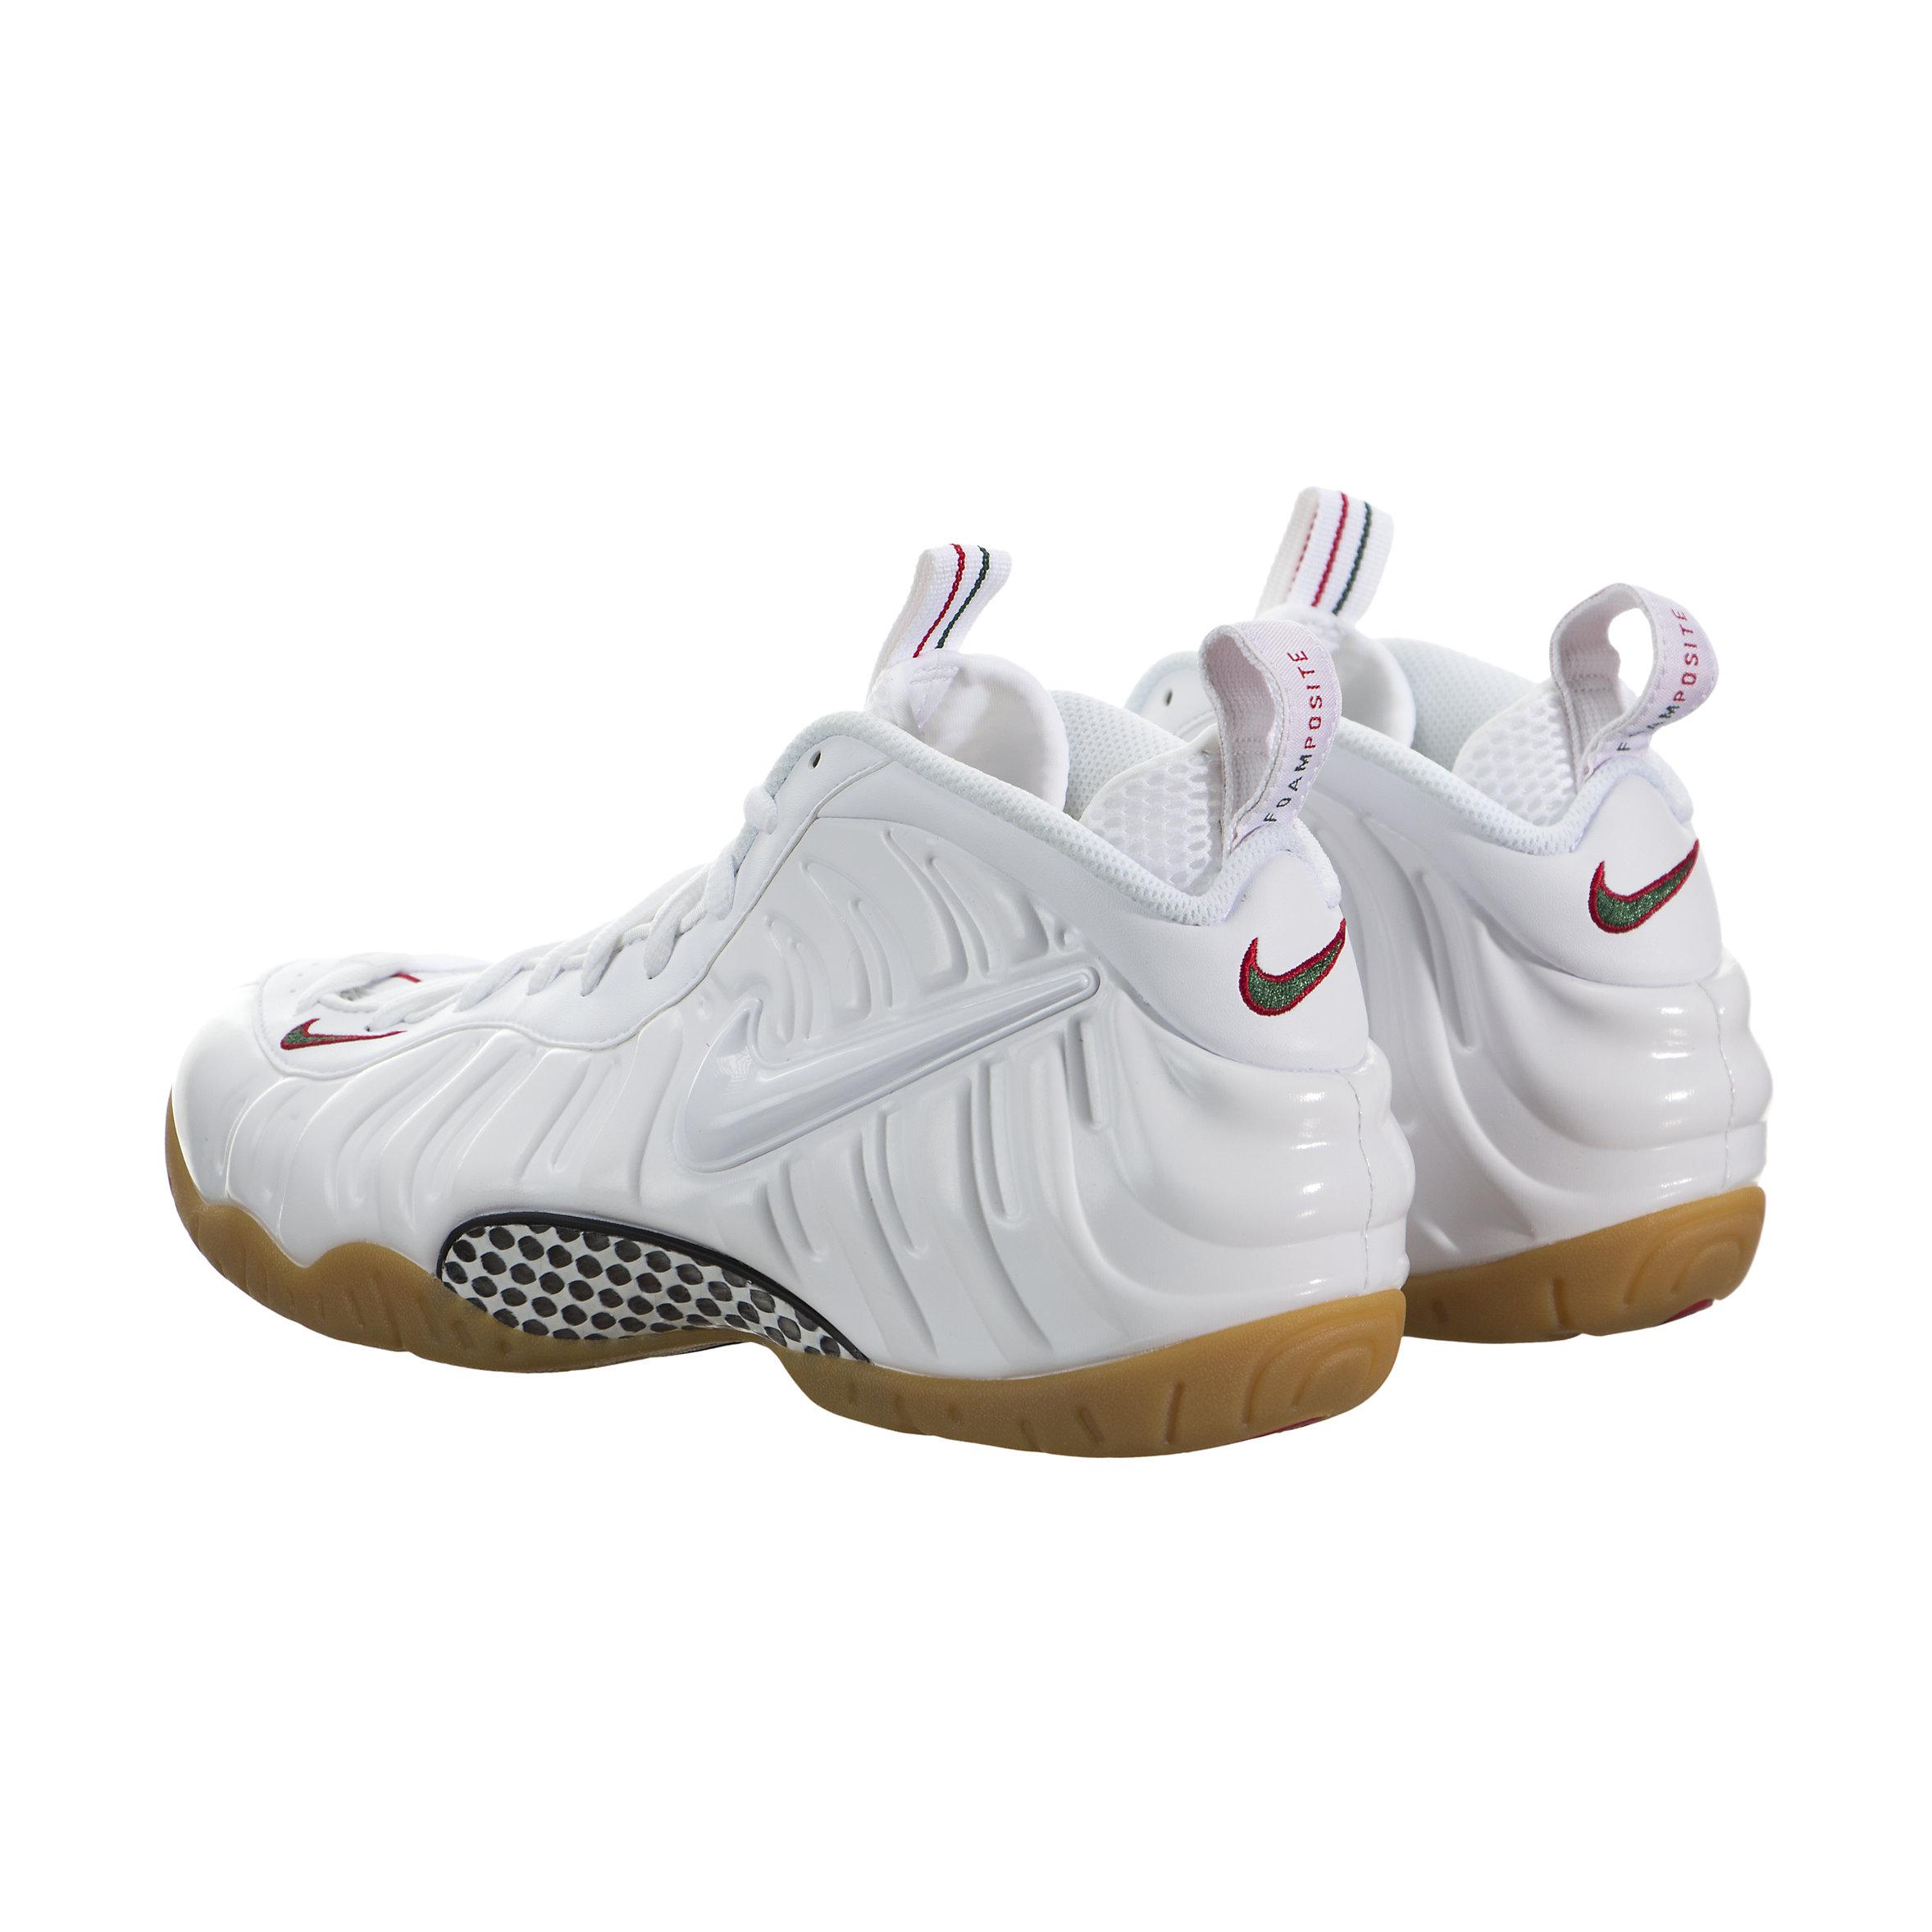 Nike foamposite white gym red gorge greeN